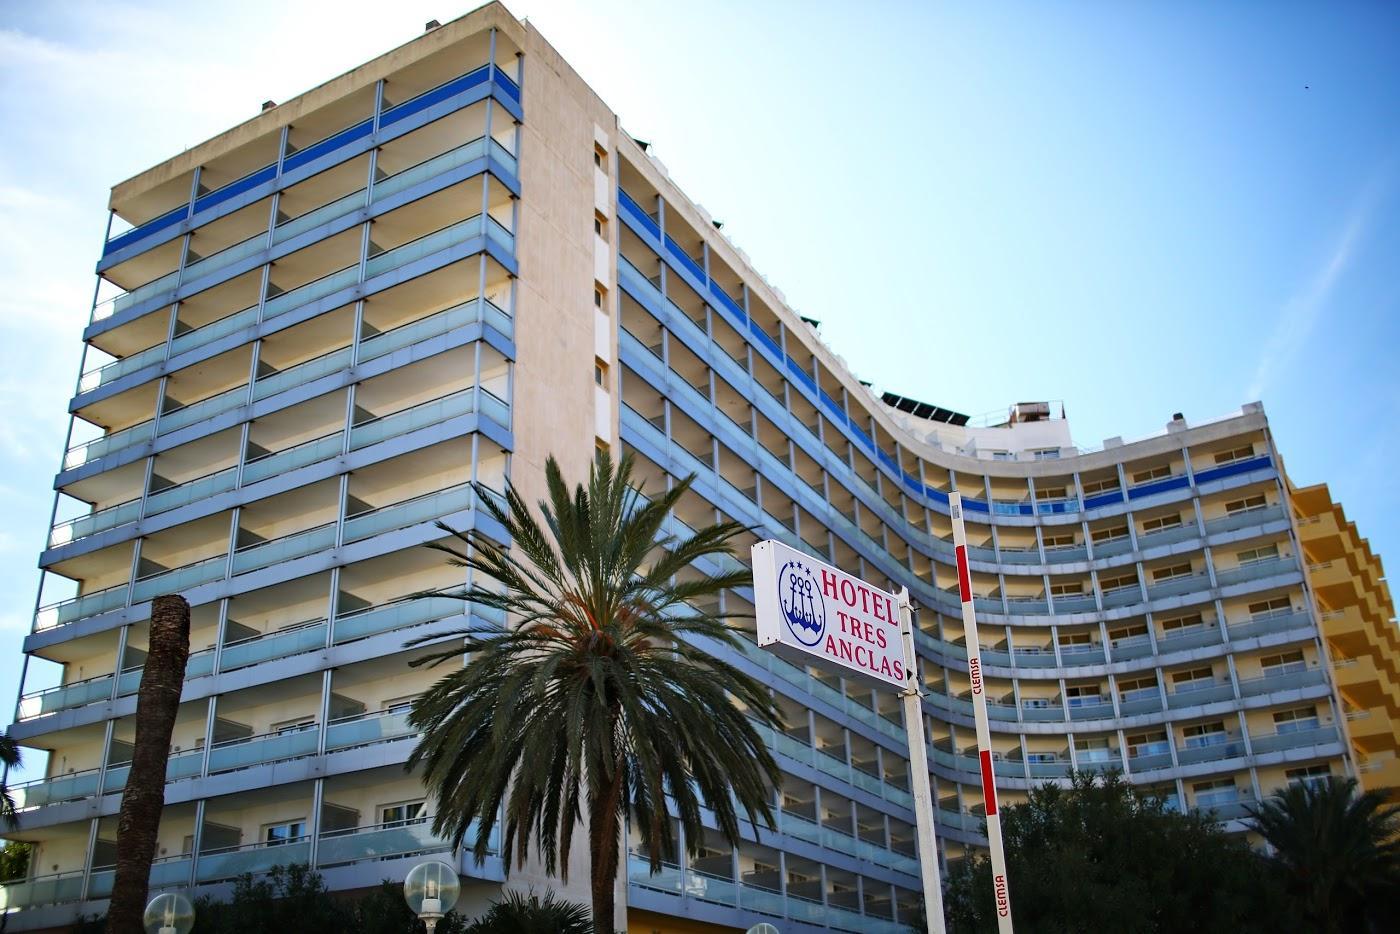 Hotel hotel apartamentos tres anclas en gand a viajes carrefour - Apartamentos baratos gandia ...